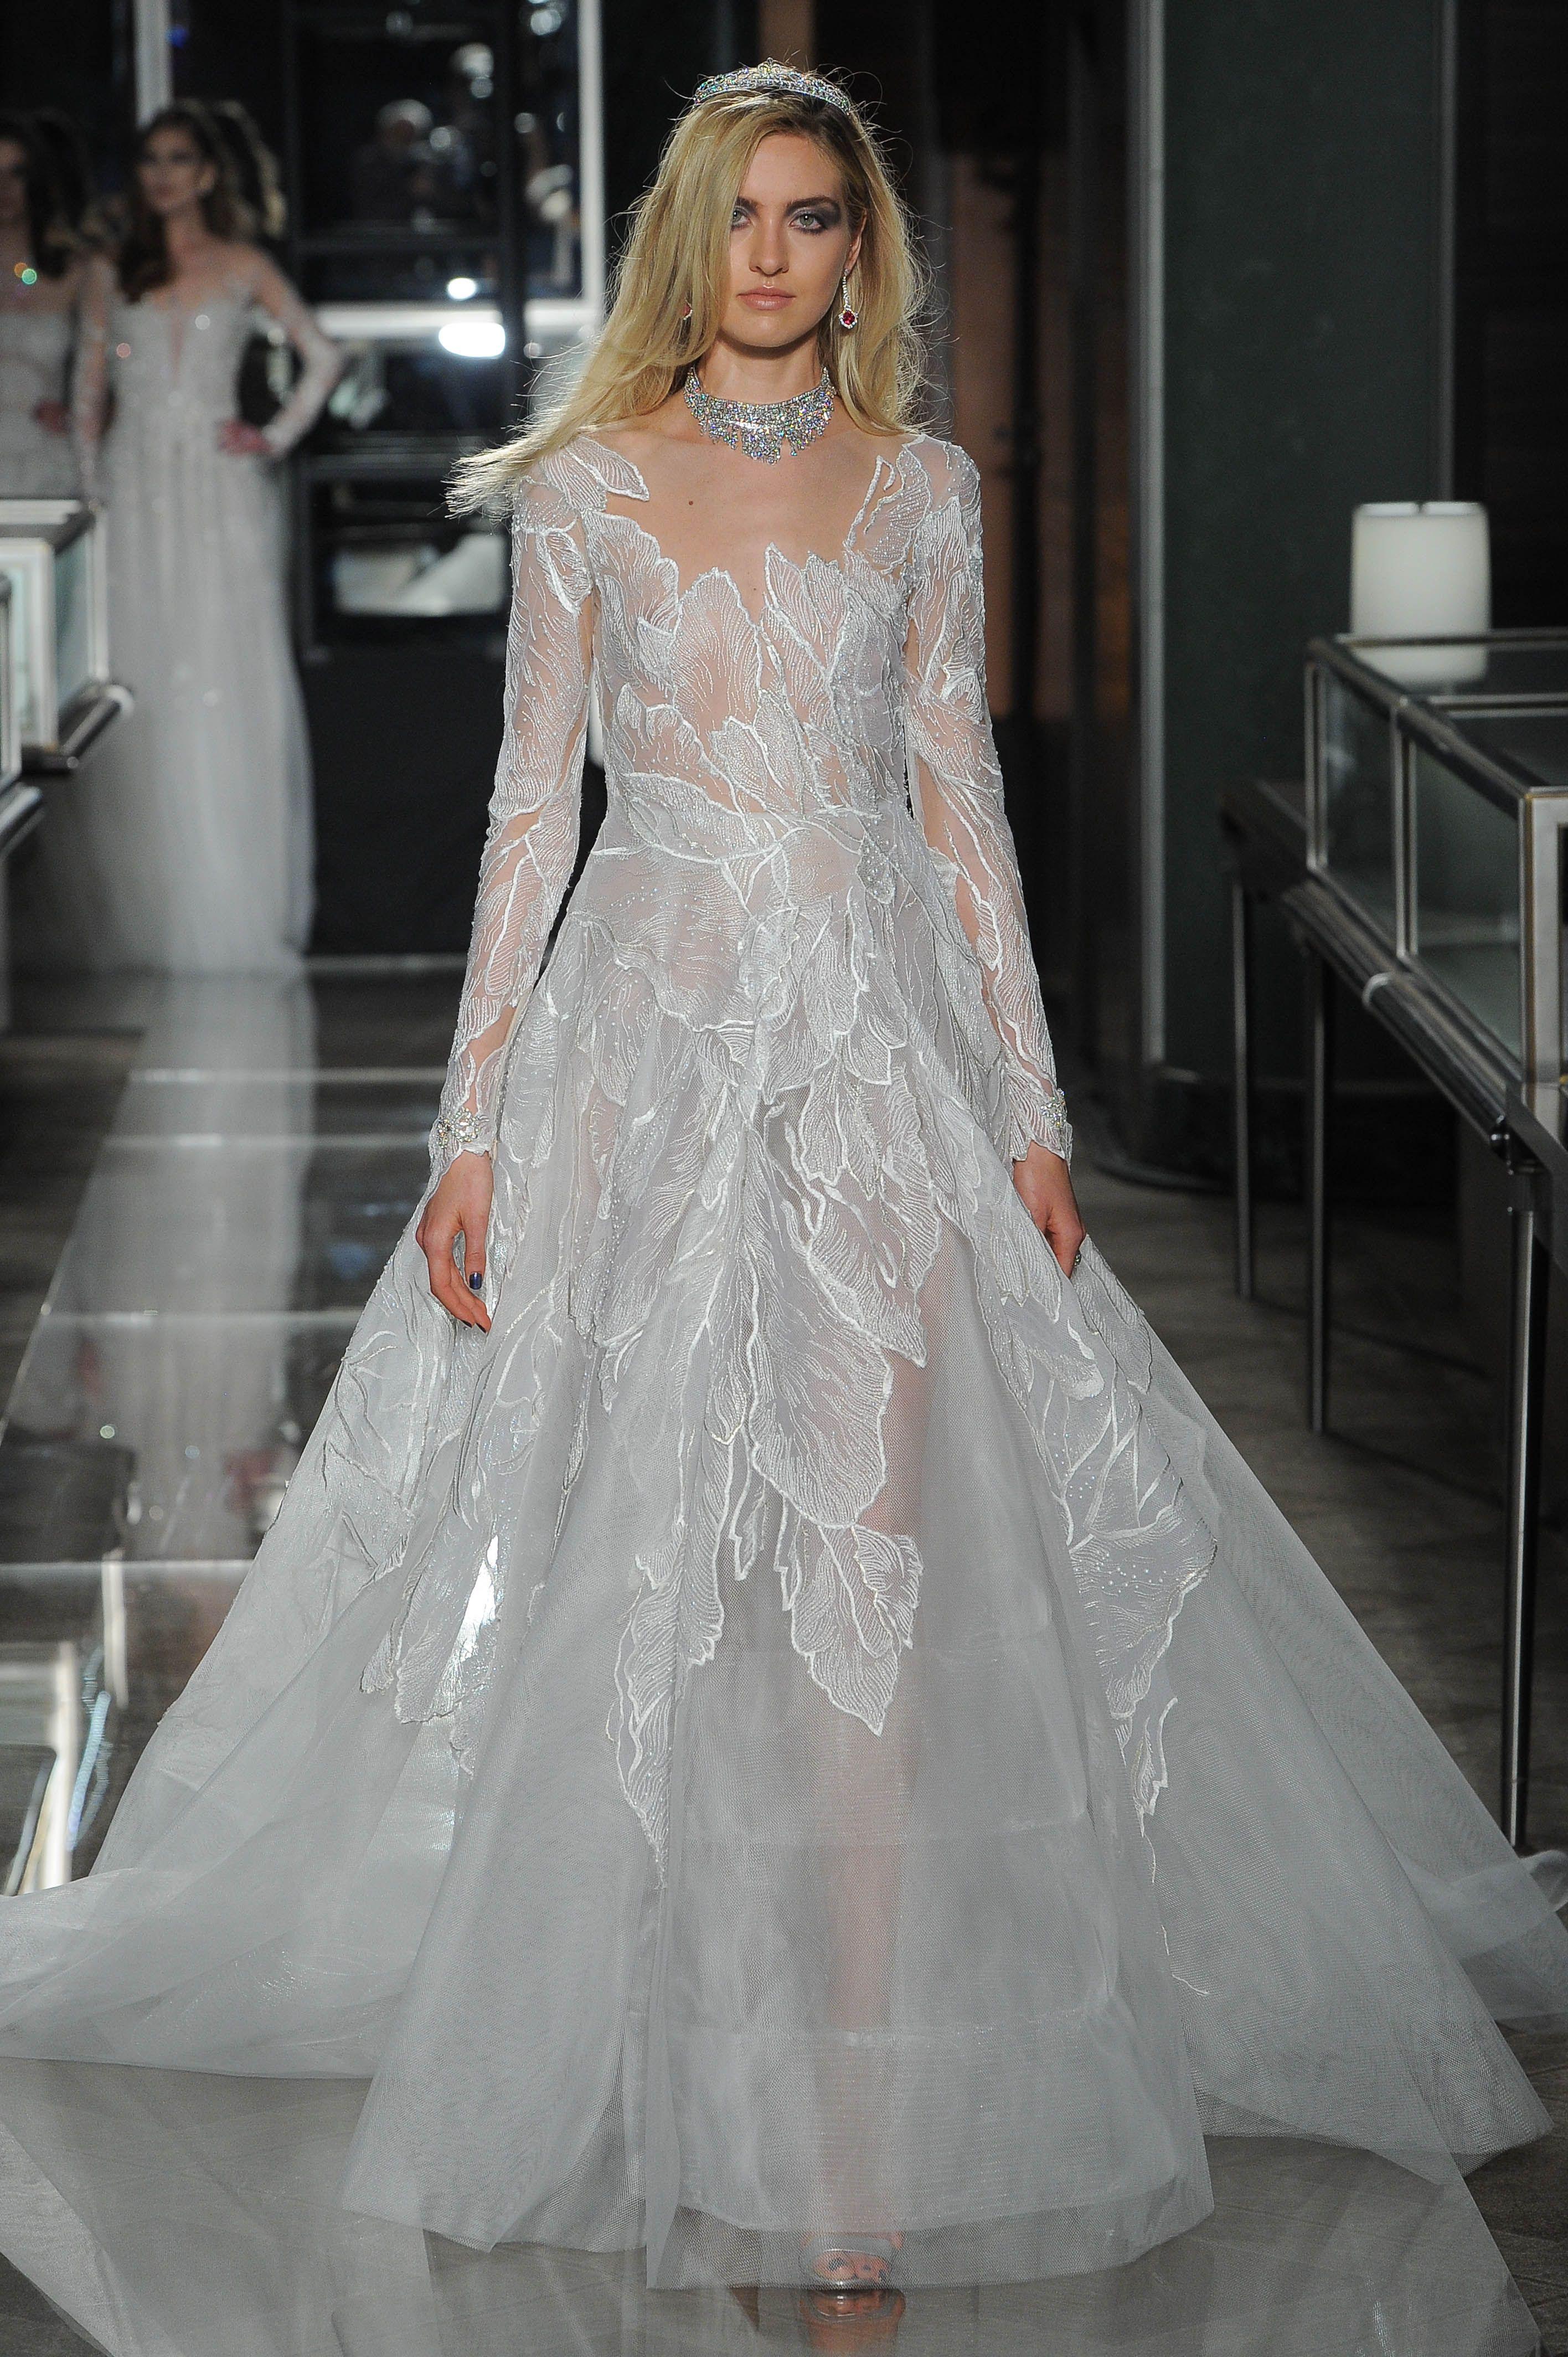 3b46be4364e6 Reem Acra - Bridal Collection - Reem Acra, Bridal Spring 2018, New York,  April 2017